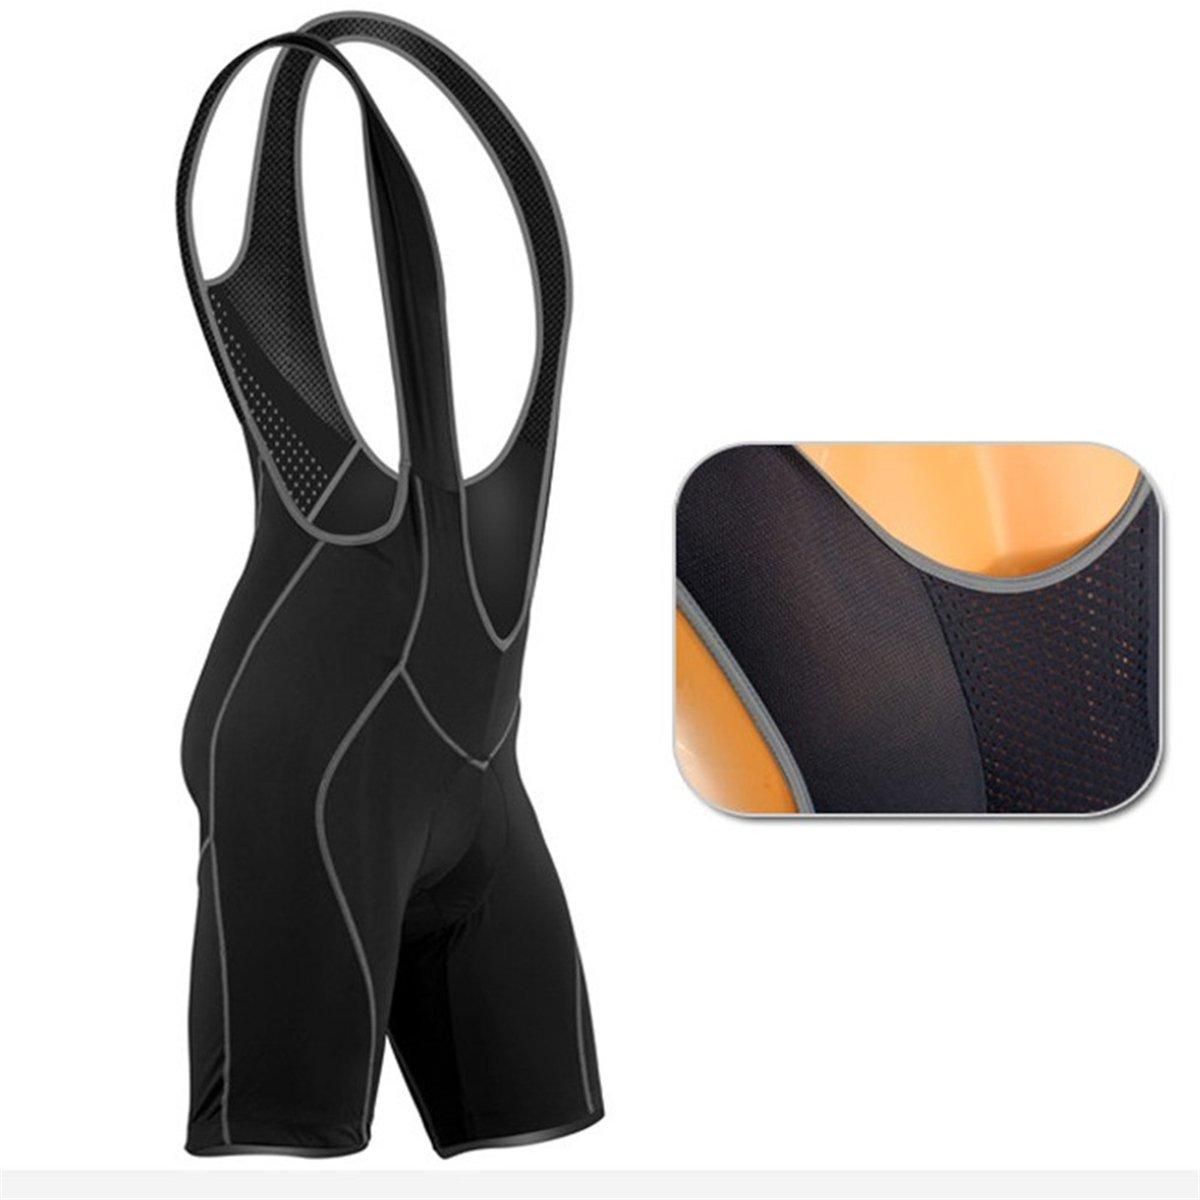 Apparelsales Mens Cycling Compression Shorts Bicycle Bike Bib Pants Skin Tights Overalls with Pad Black